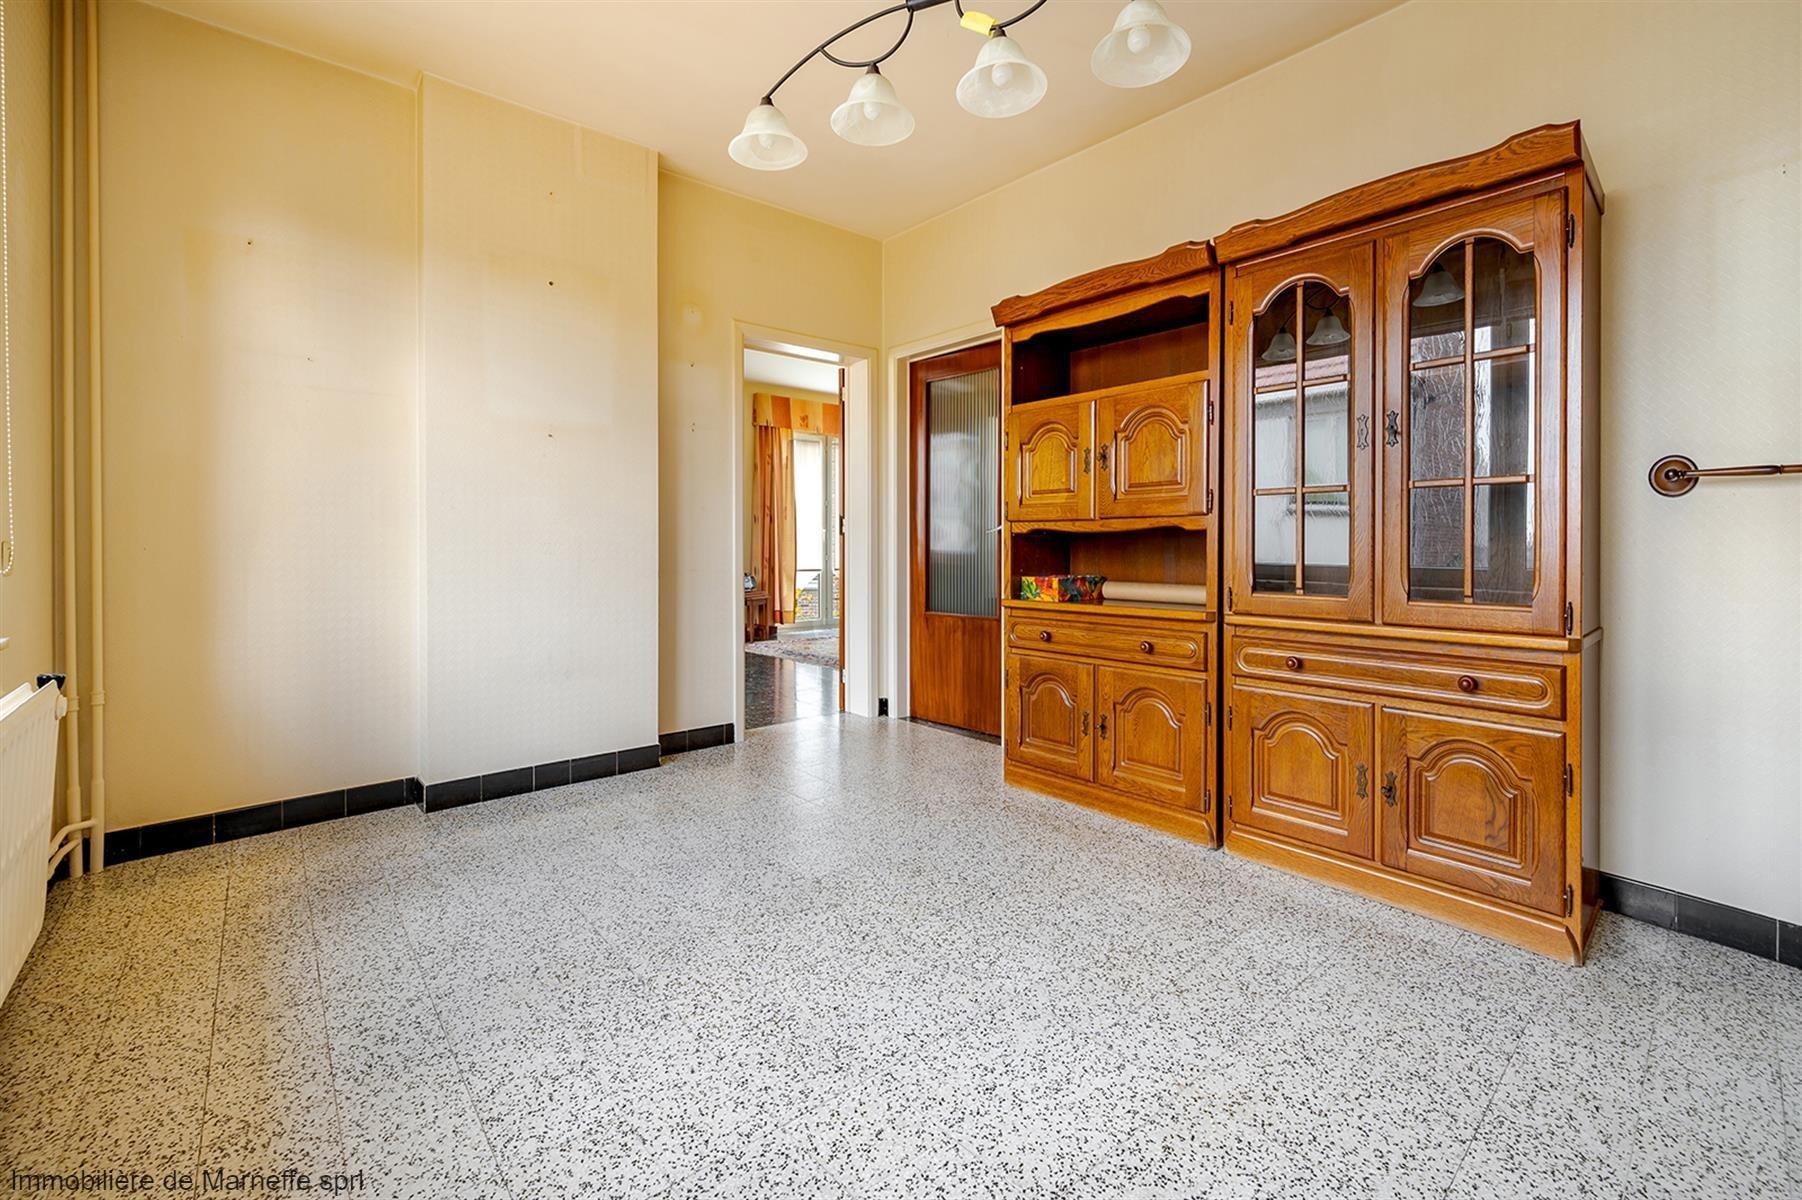 Maison - Berloz - #4343525-10